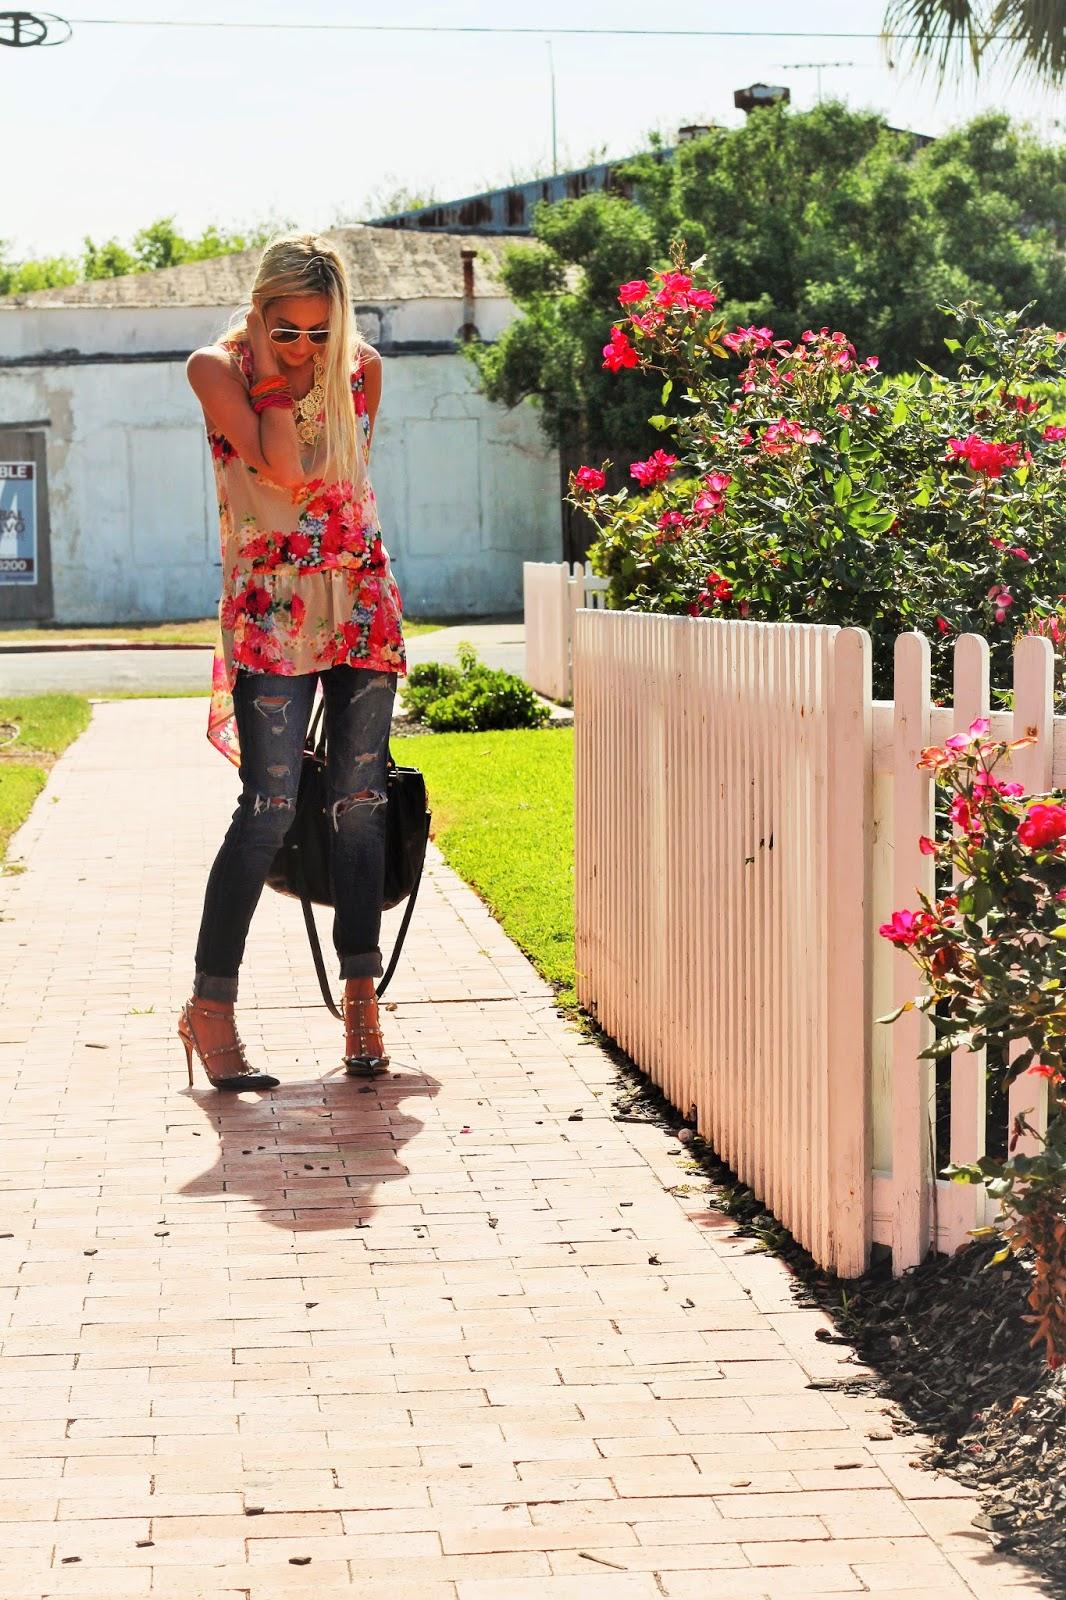 http://www.fabphilosophy.blogspot.com/2014/05/ootd-floral-print-ripped-denim.html